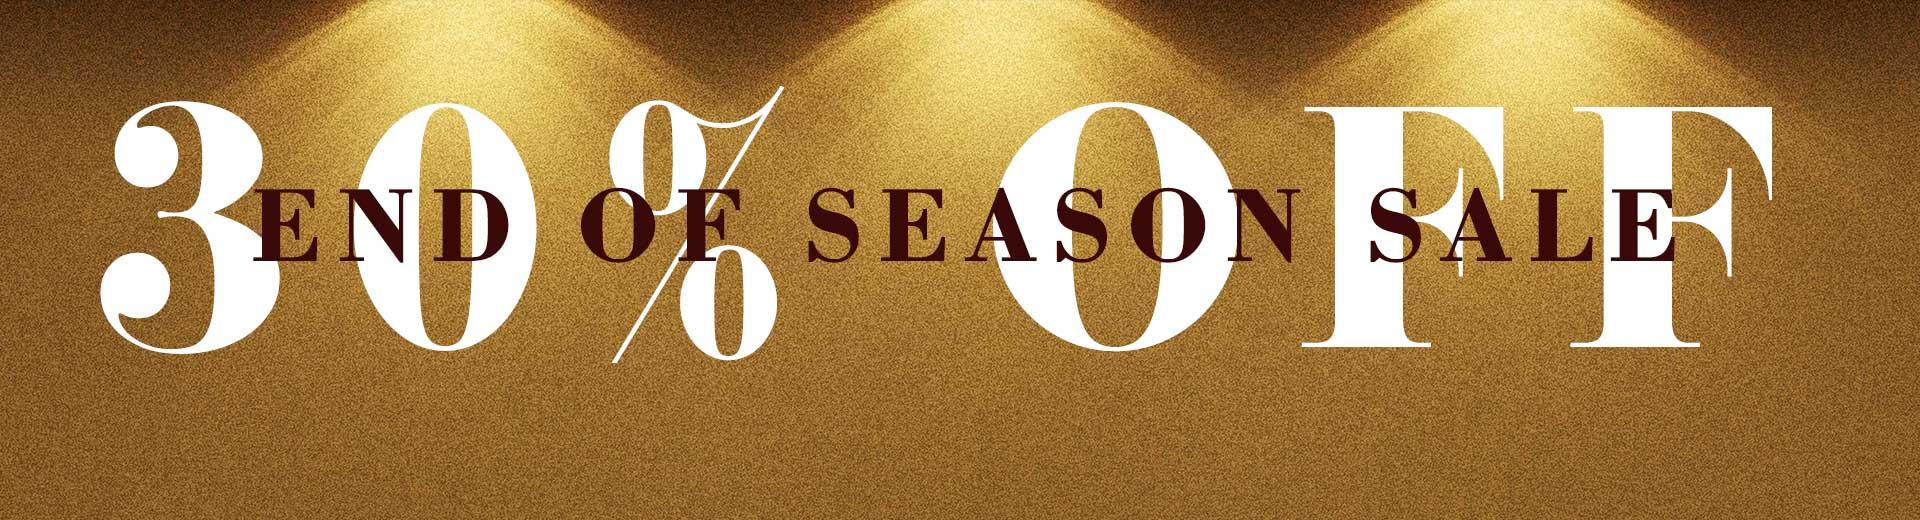 Escaro End Of Season Sale